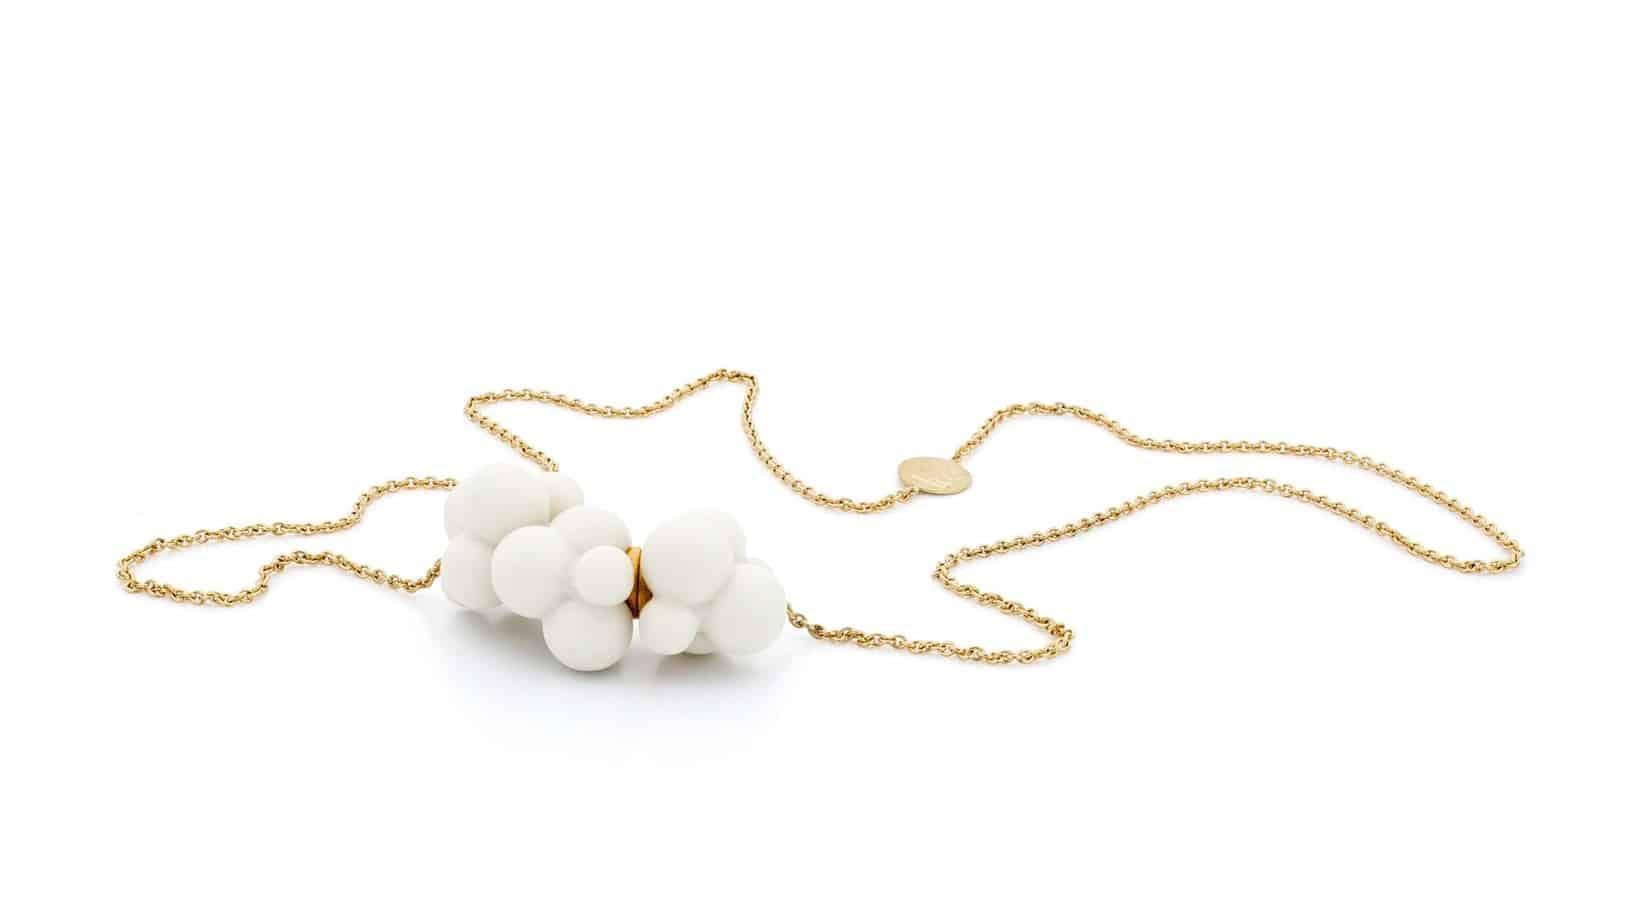 Cloud necklace by atelier luz at designyard contemporary jewellery gallery